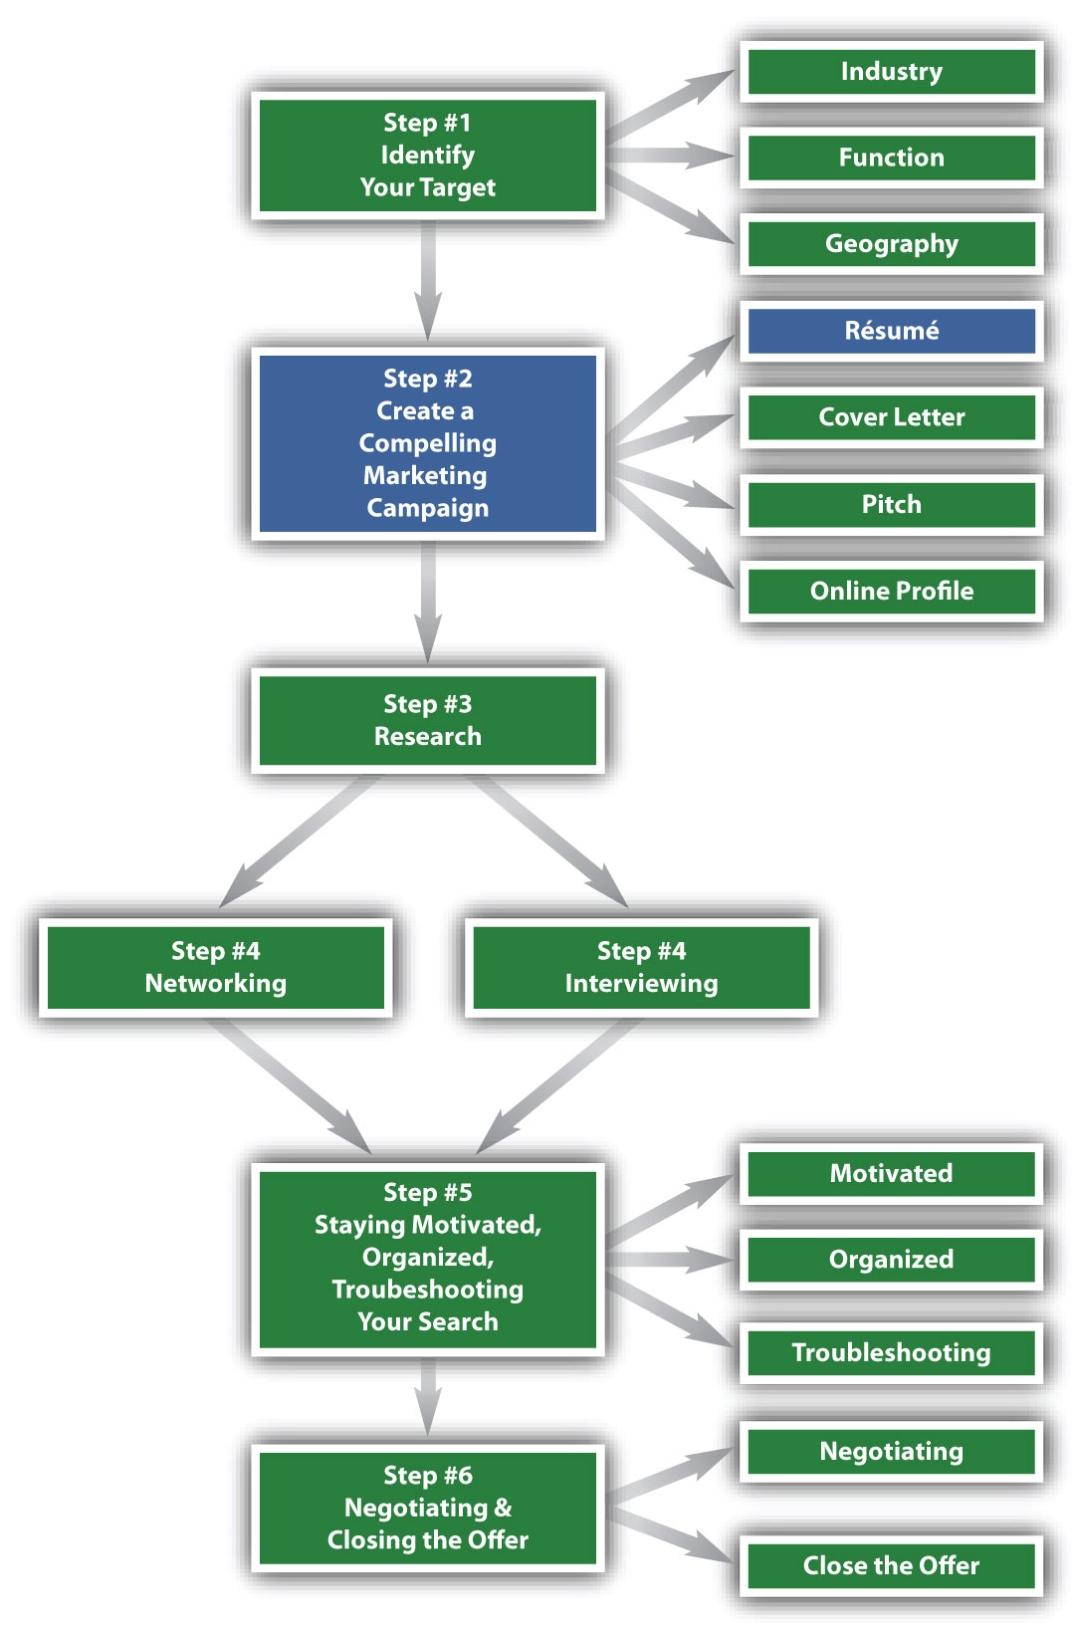 six steps to job search success v1 0 attributed to caroline ceniza levine connie thanasoulis cerrachio